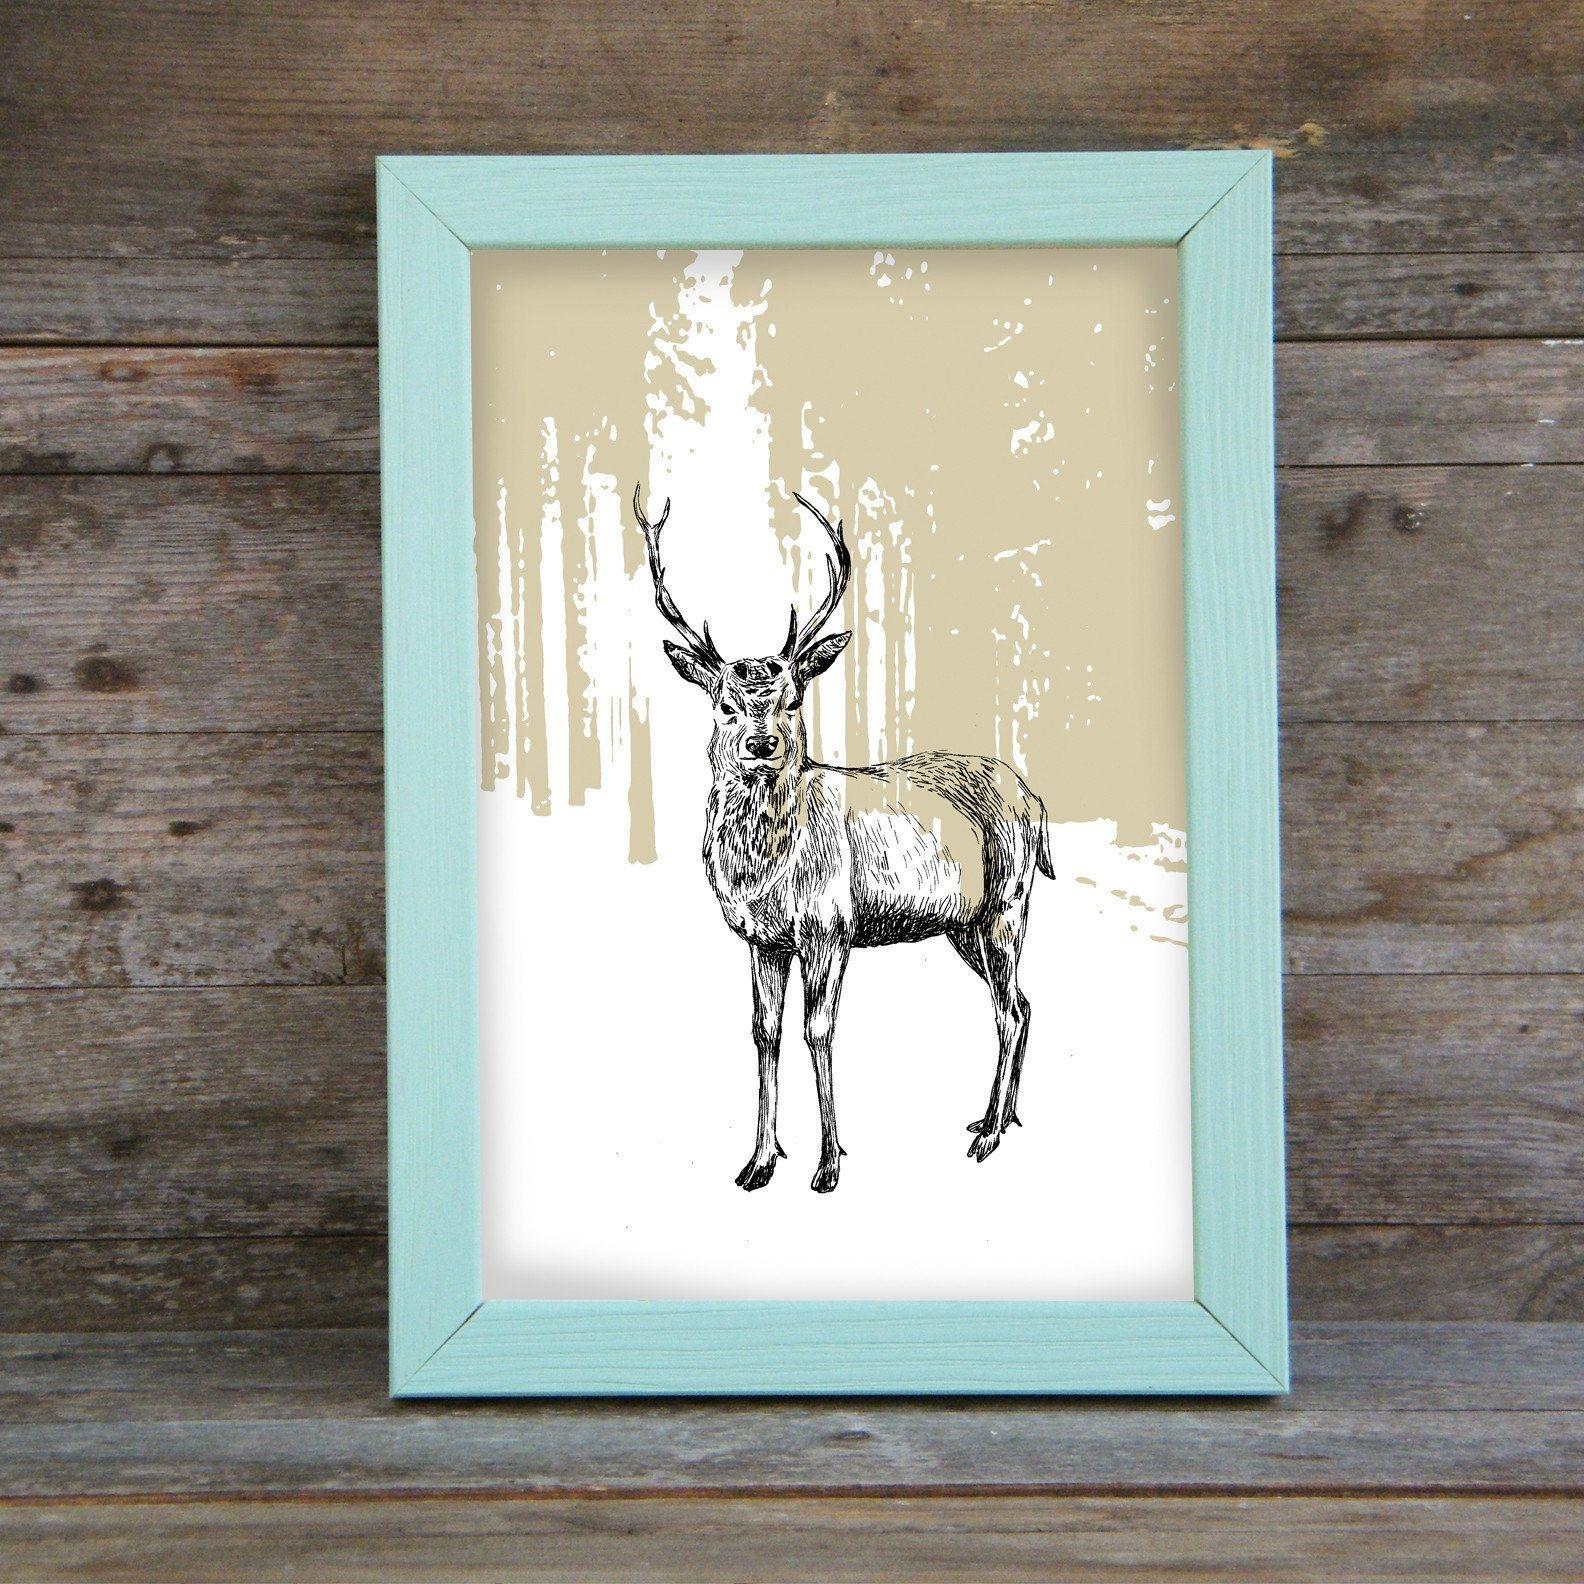 Deer wall art modern deer poster woodland animals printable cabin